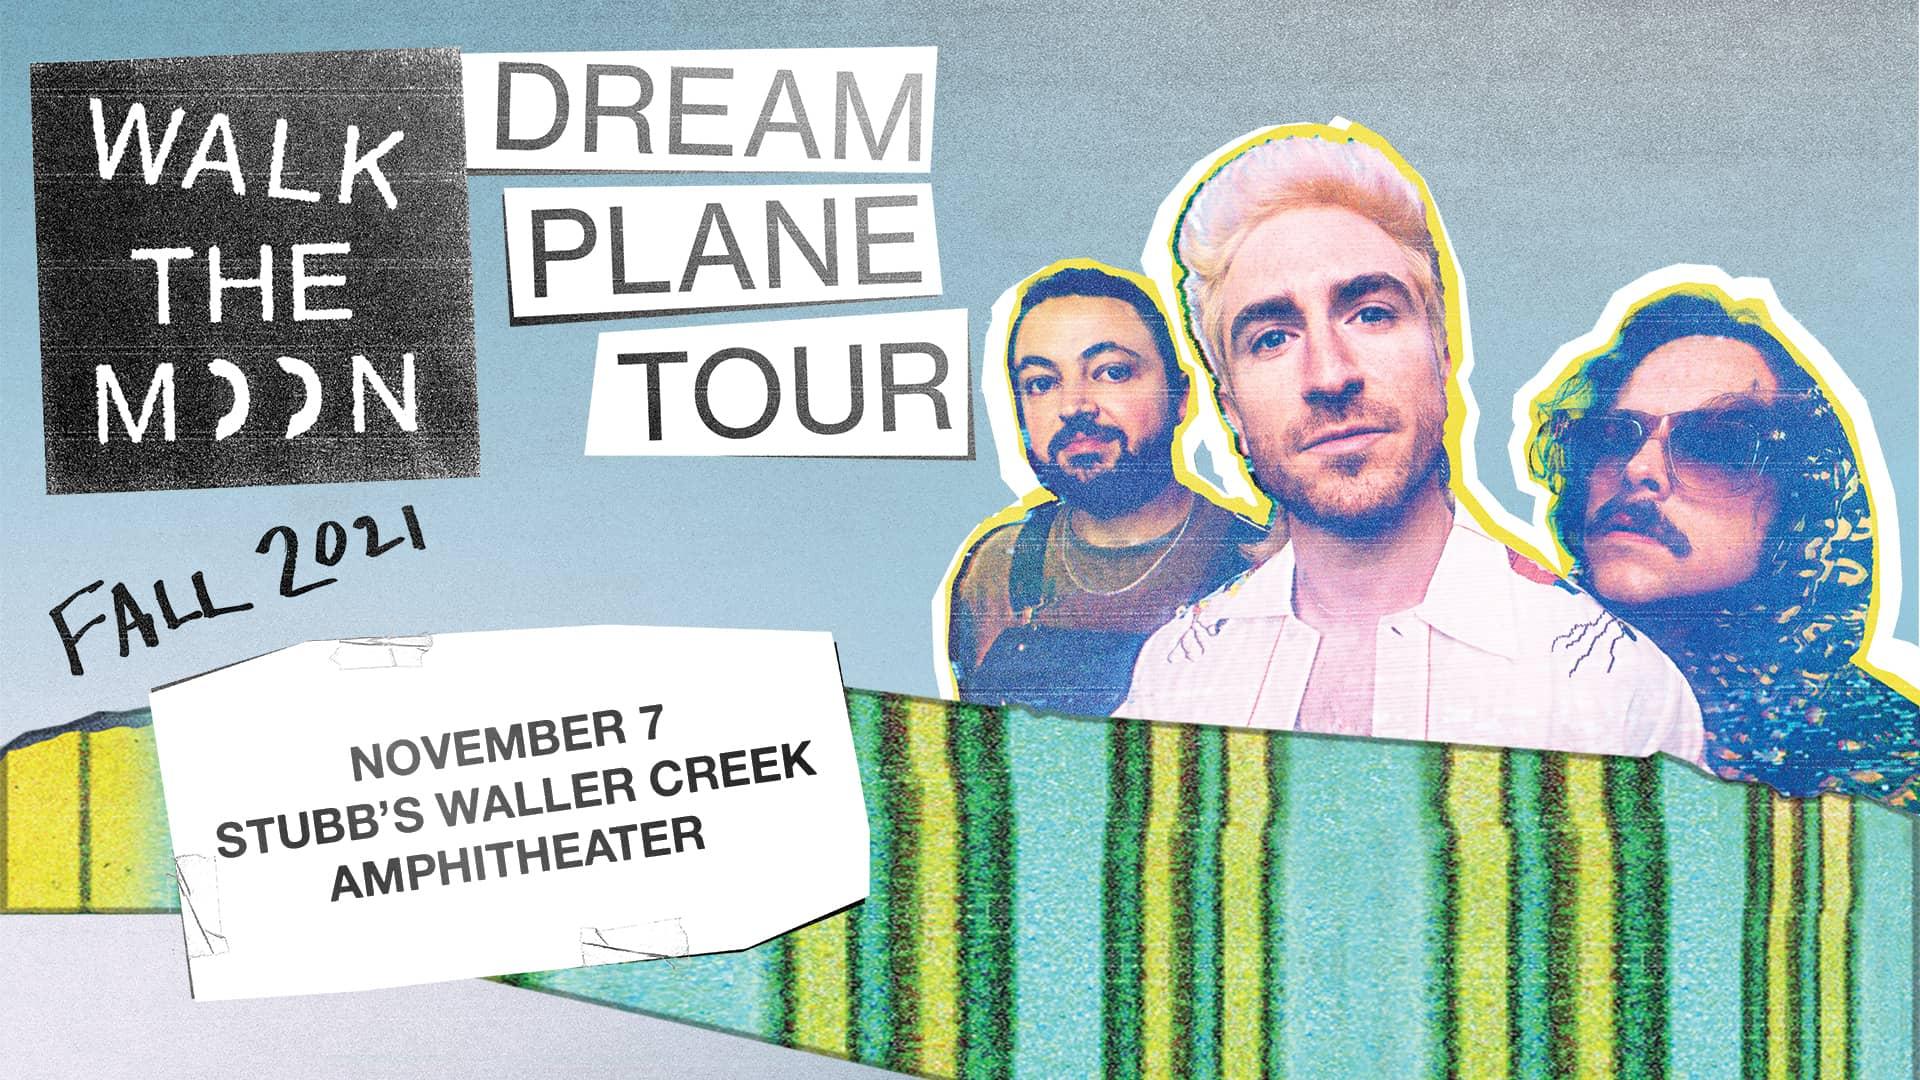 Walk the Moon Dream Plane Tour Fall 2021 Stubb's Waller Creek Amphitheater